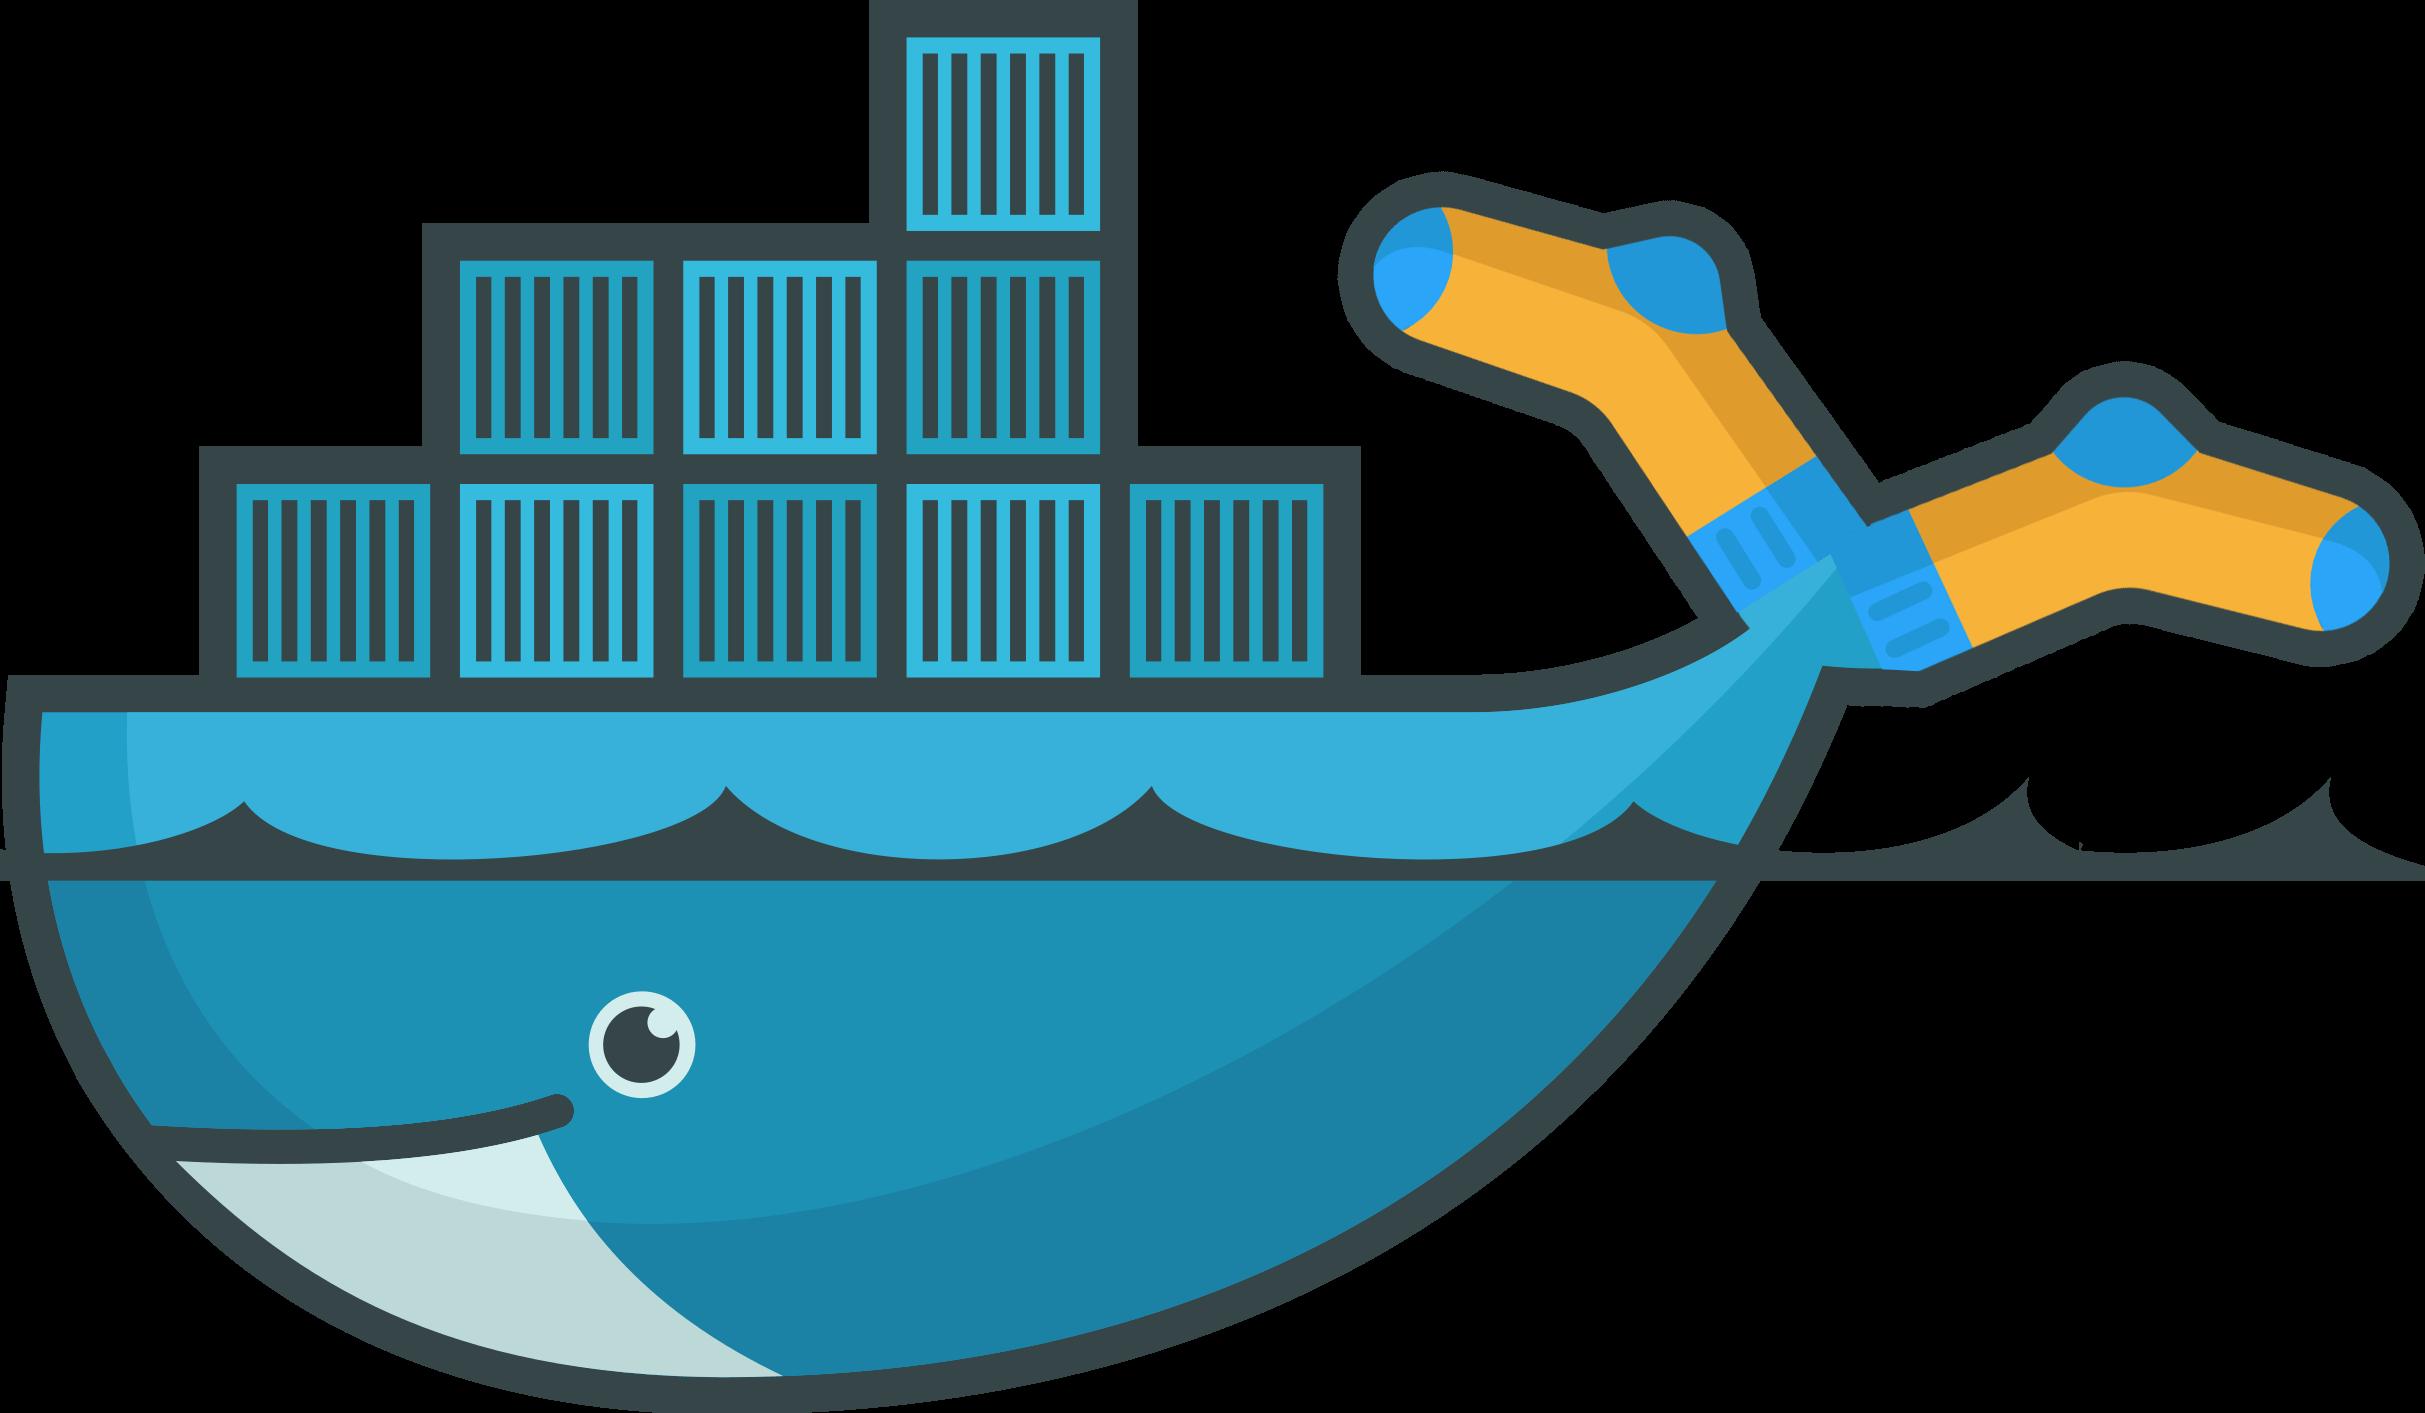 The Danger of Exposing Docker Sock_佚名 - jishuwen(技术文)